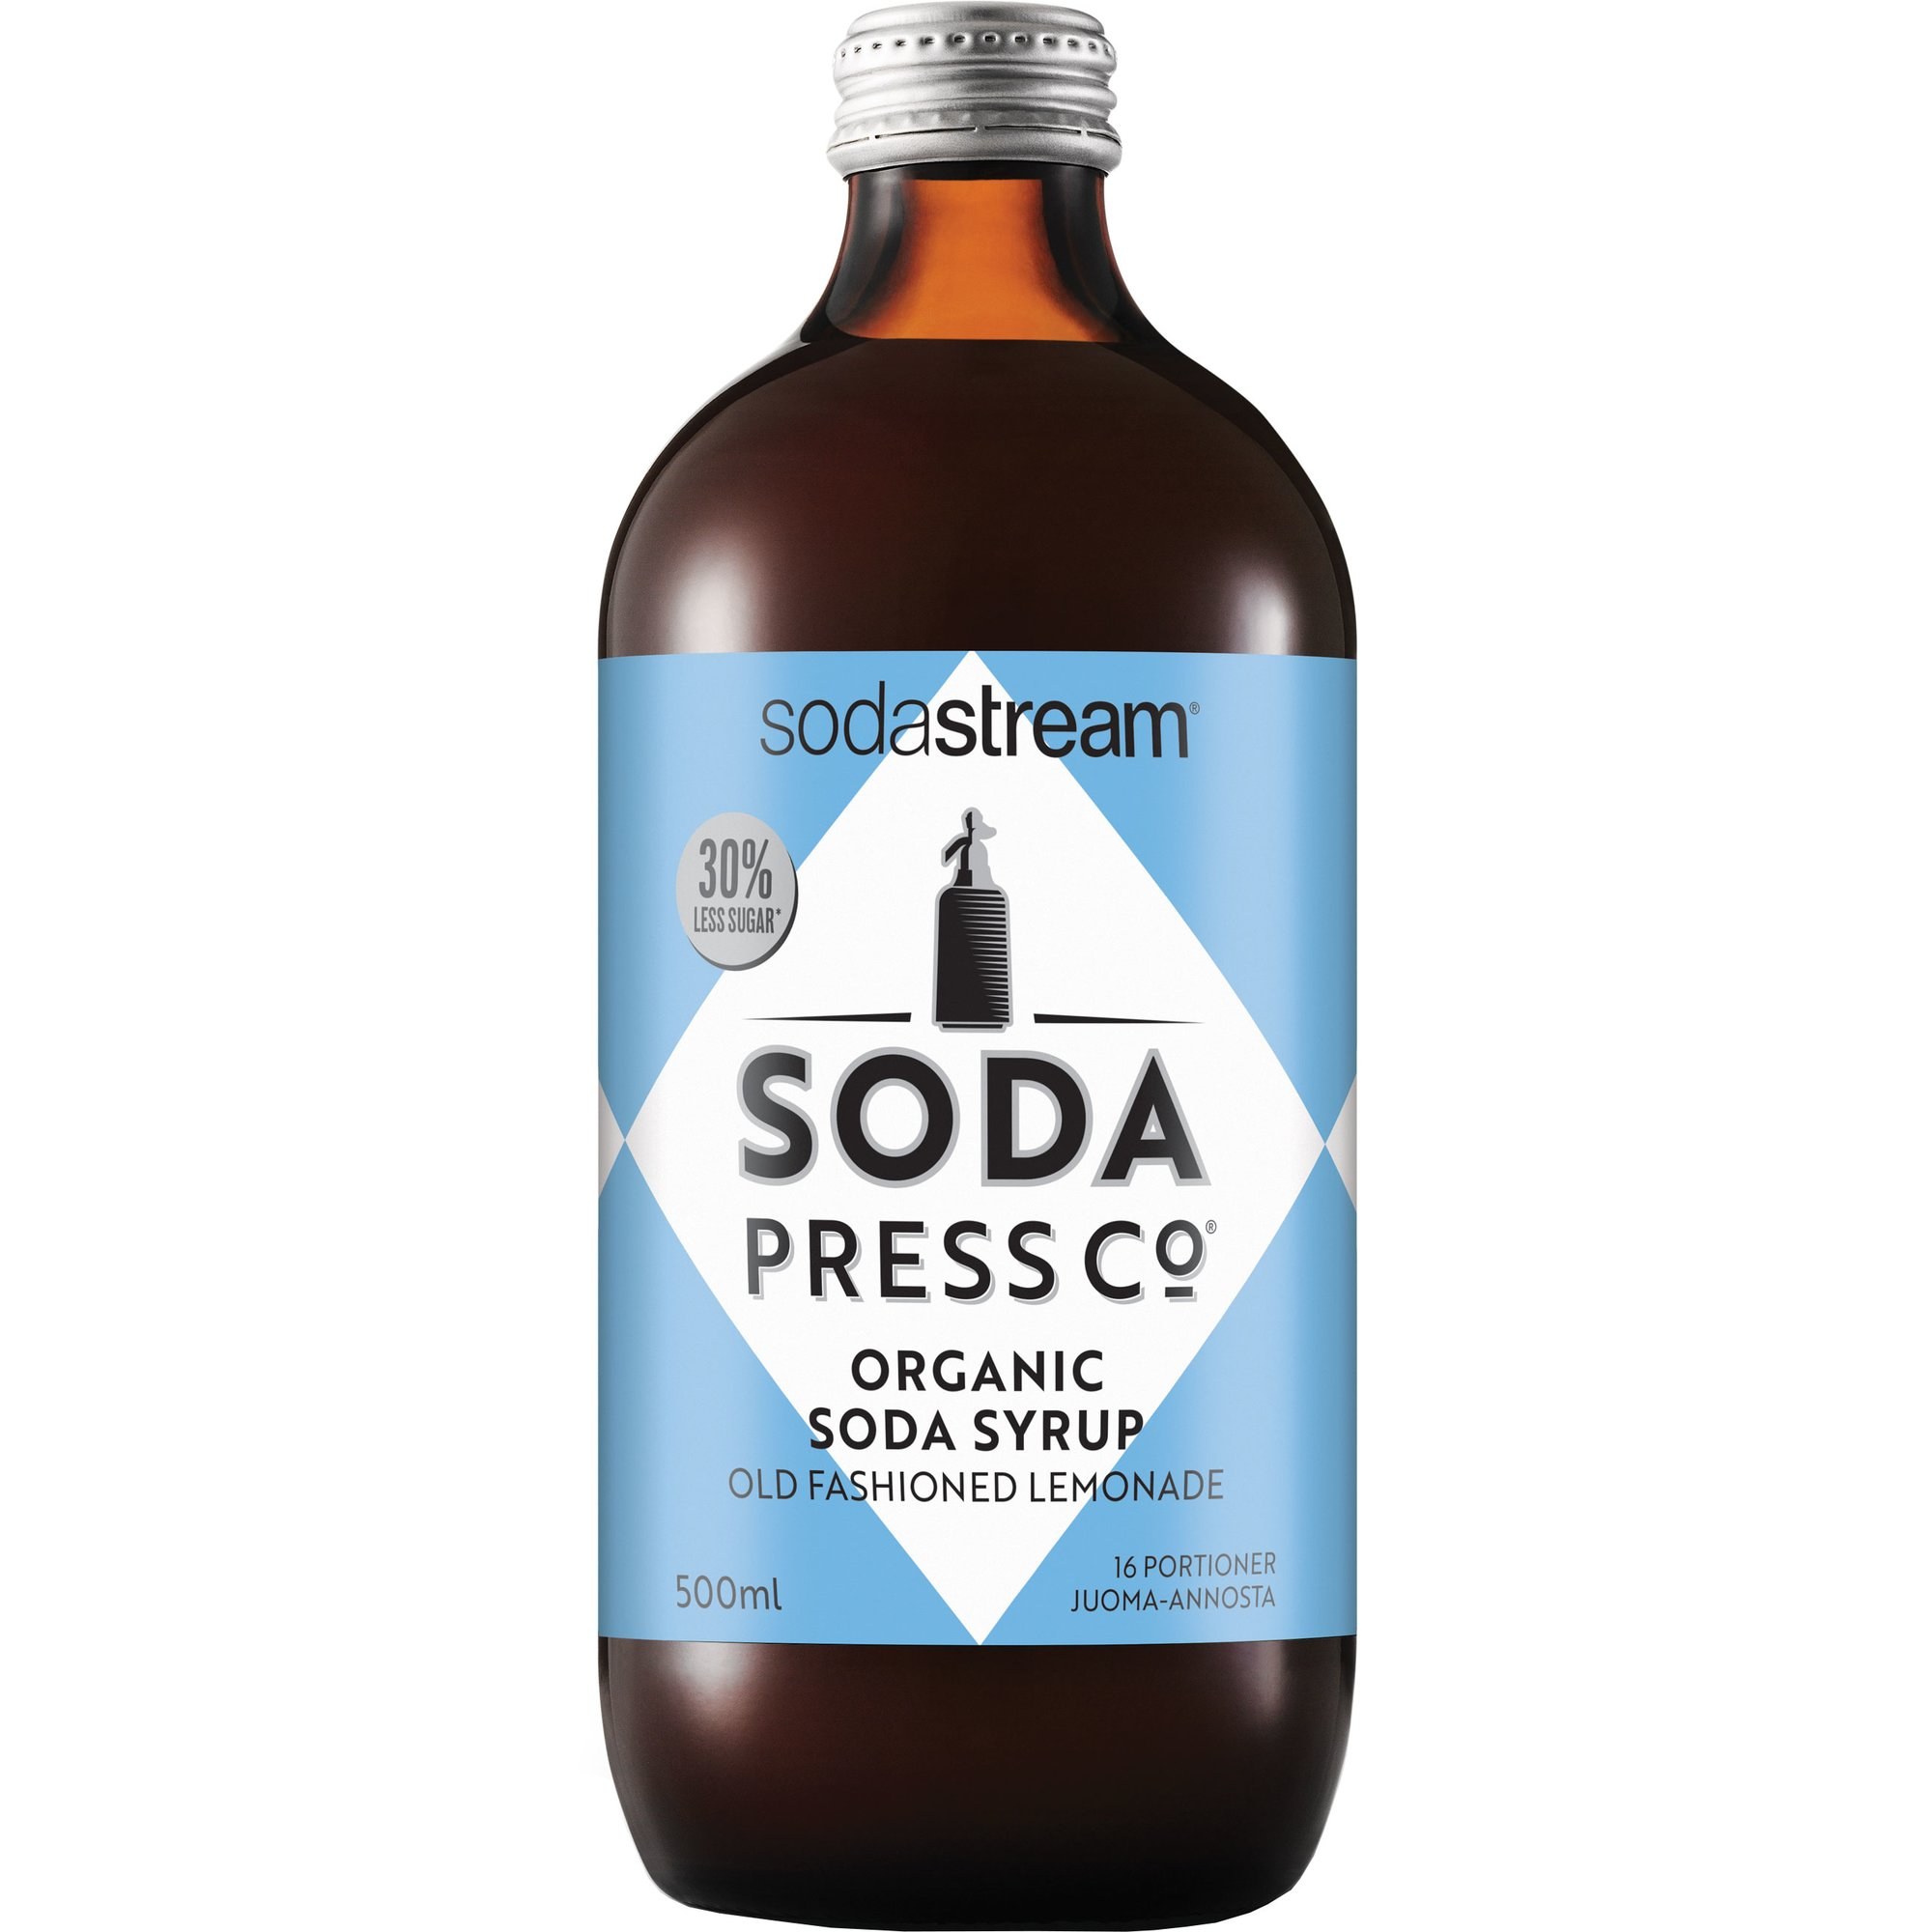 SodaStream Old Fashioned Lemonade Ekologisk Smakkoncentrat 500 ml